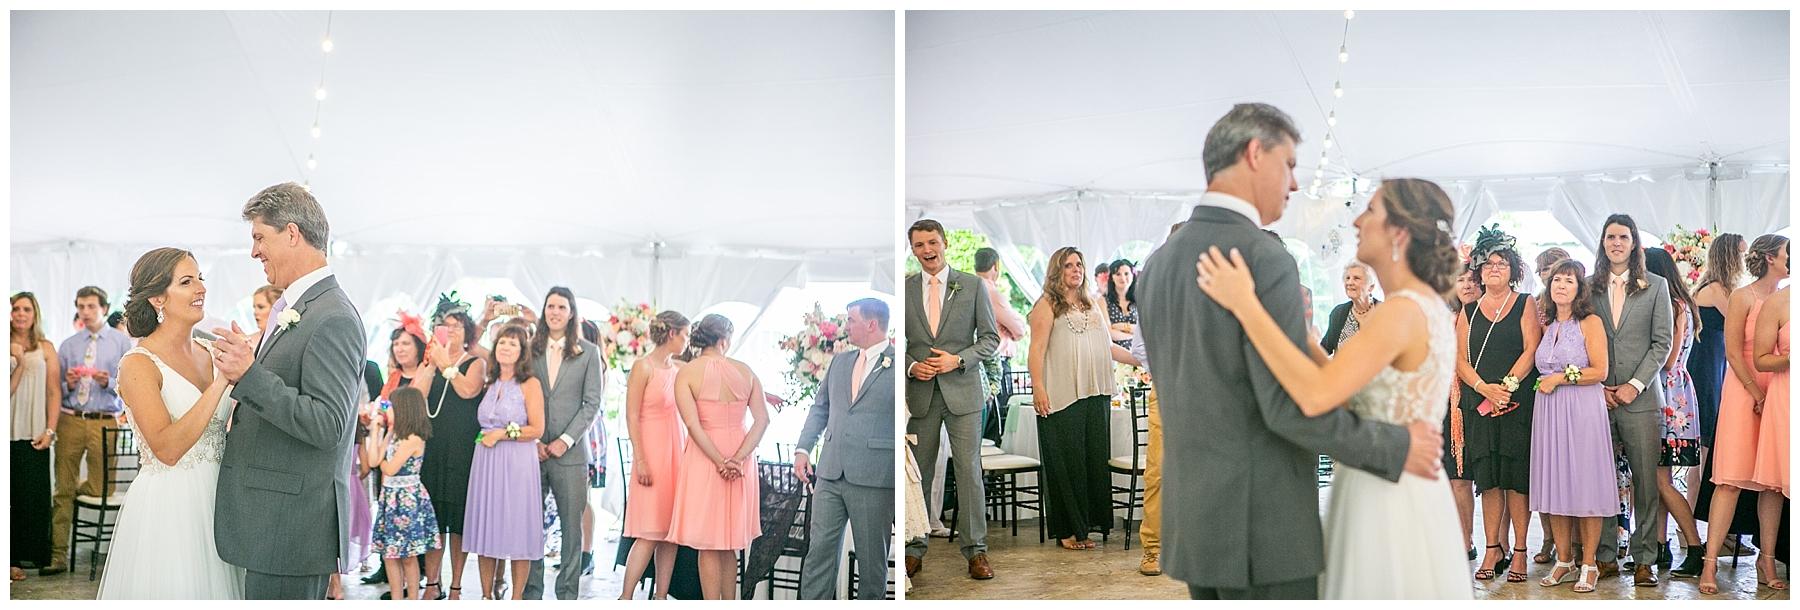 Chelsea Phil Bohemia River Overlook Wedding Living Radiant Photography photos_0136.jpg